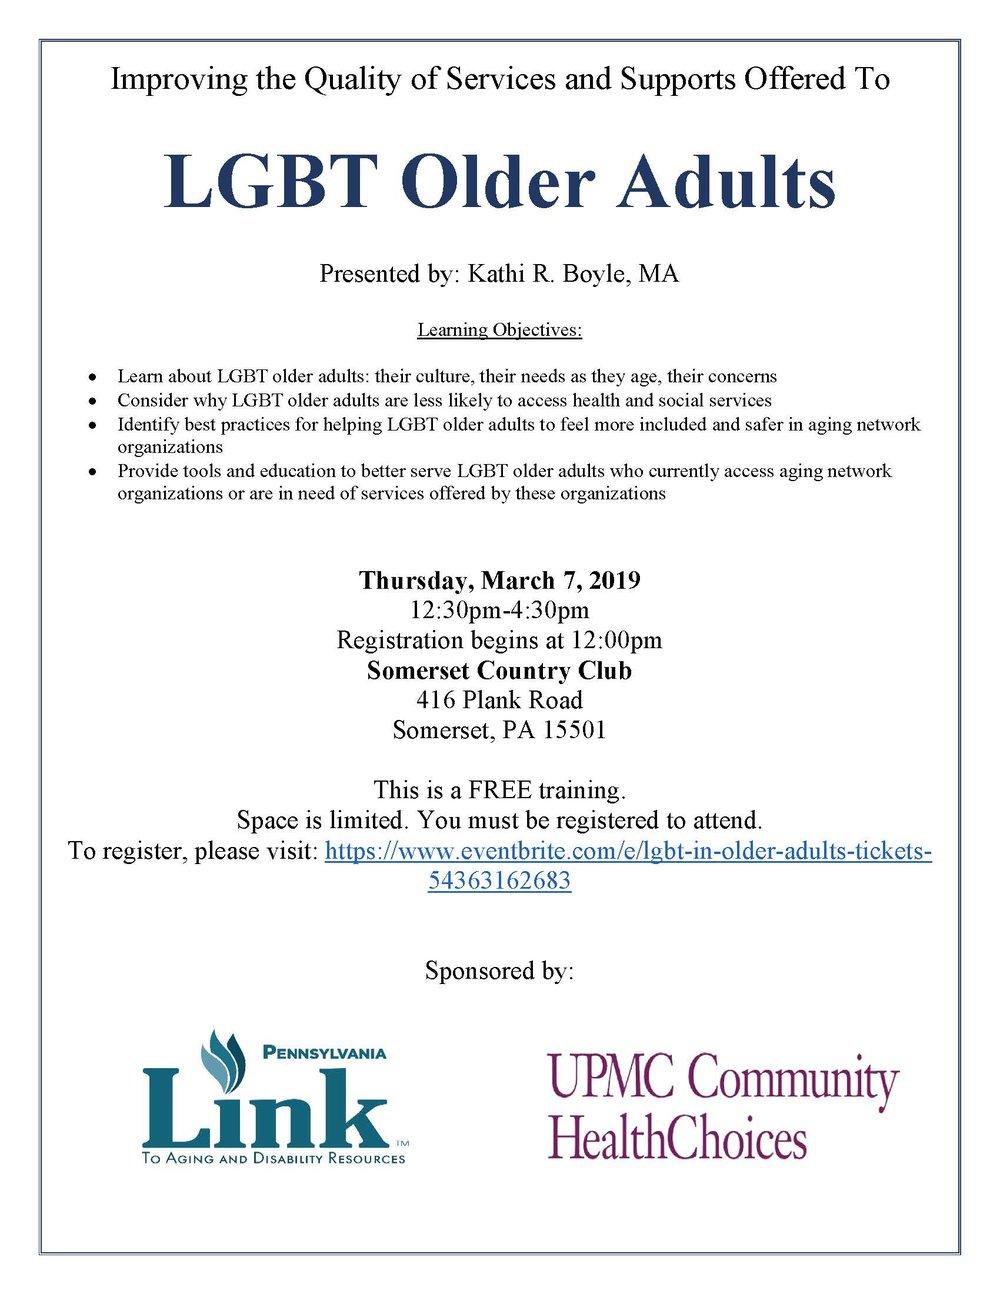 LGBT Flyer.jpg